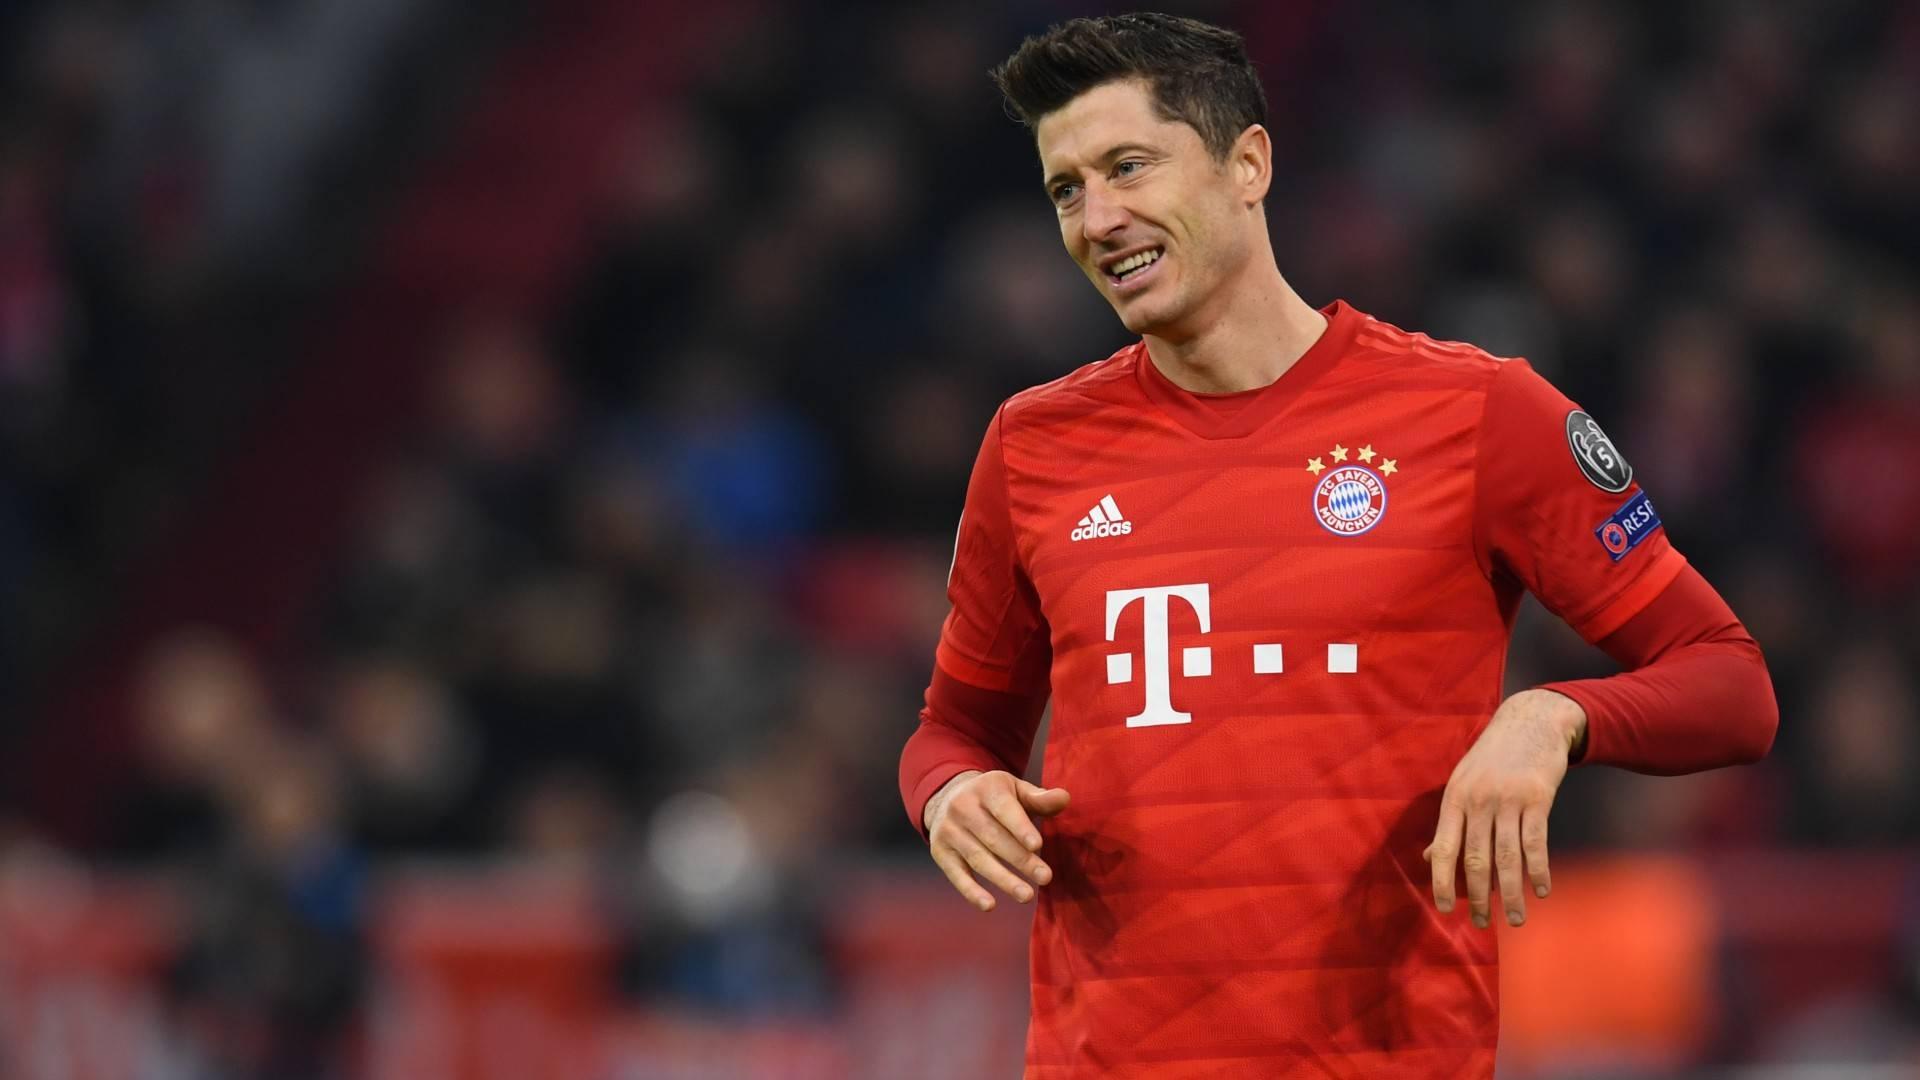 Watch Bayern München v Chelsea Live Stream | DAZN JP